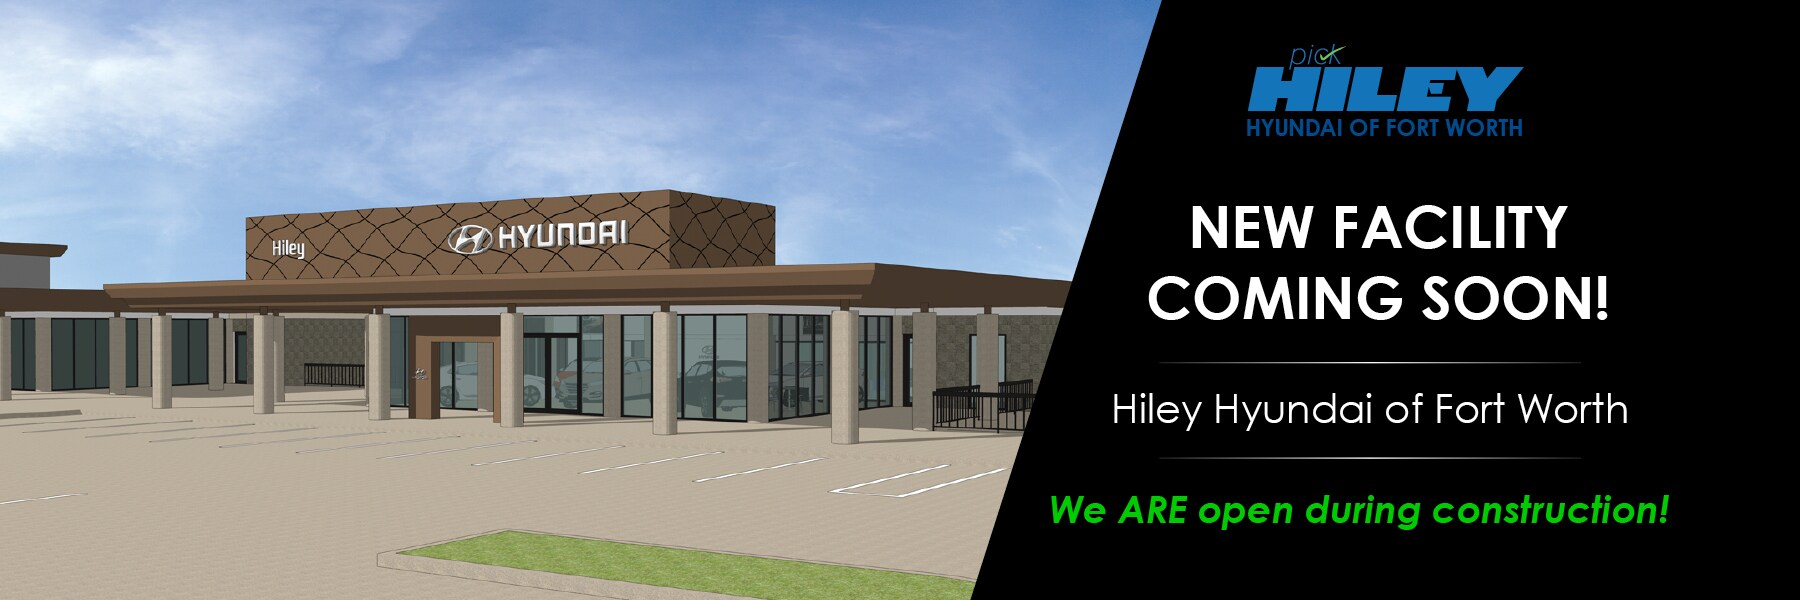 Hiley Hyundai of Fort Worth, New & Used Hyundai Dealership in Fort Worth,  ...